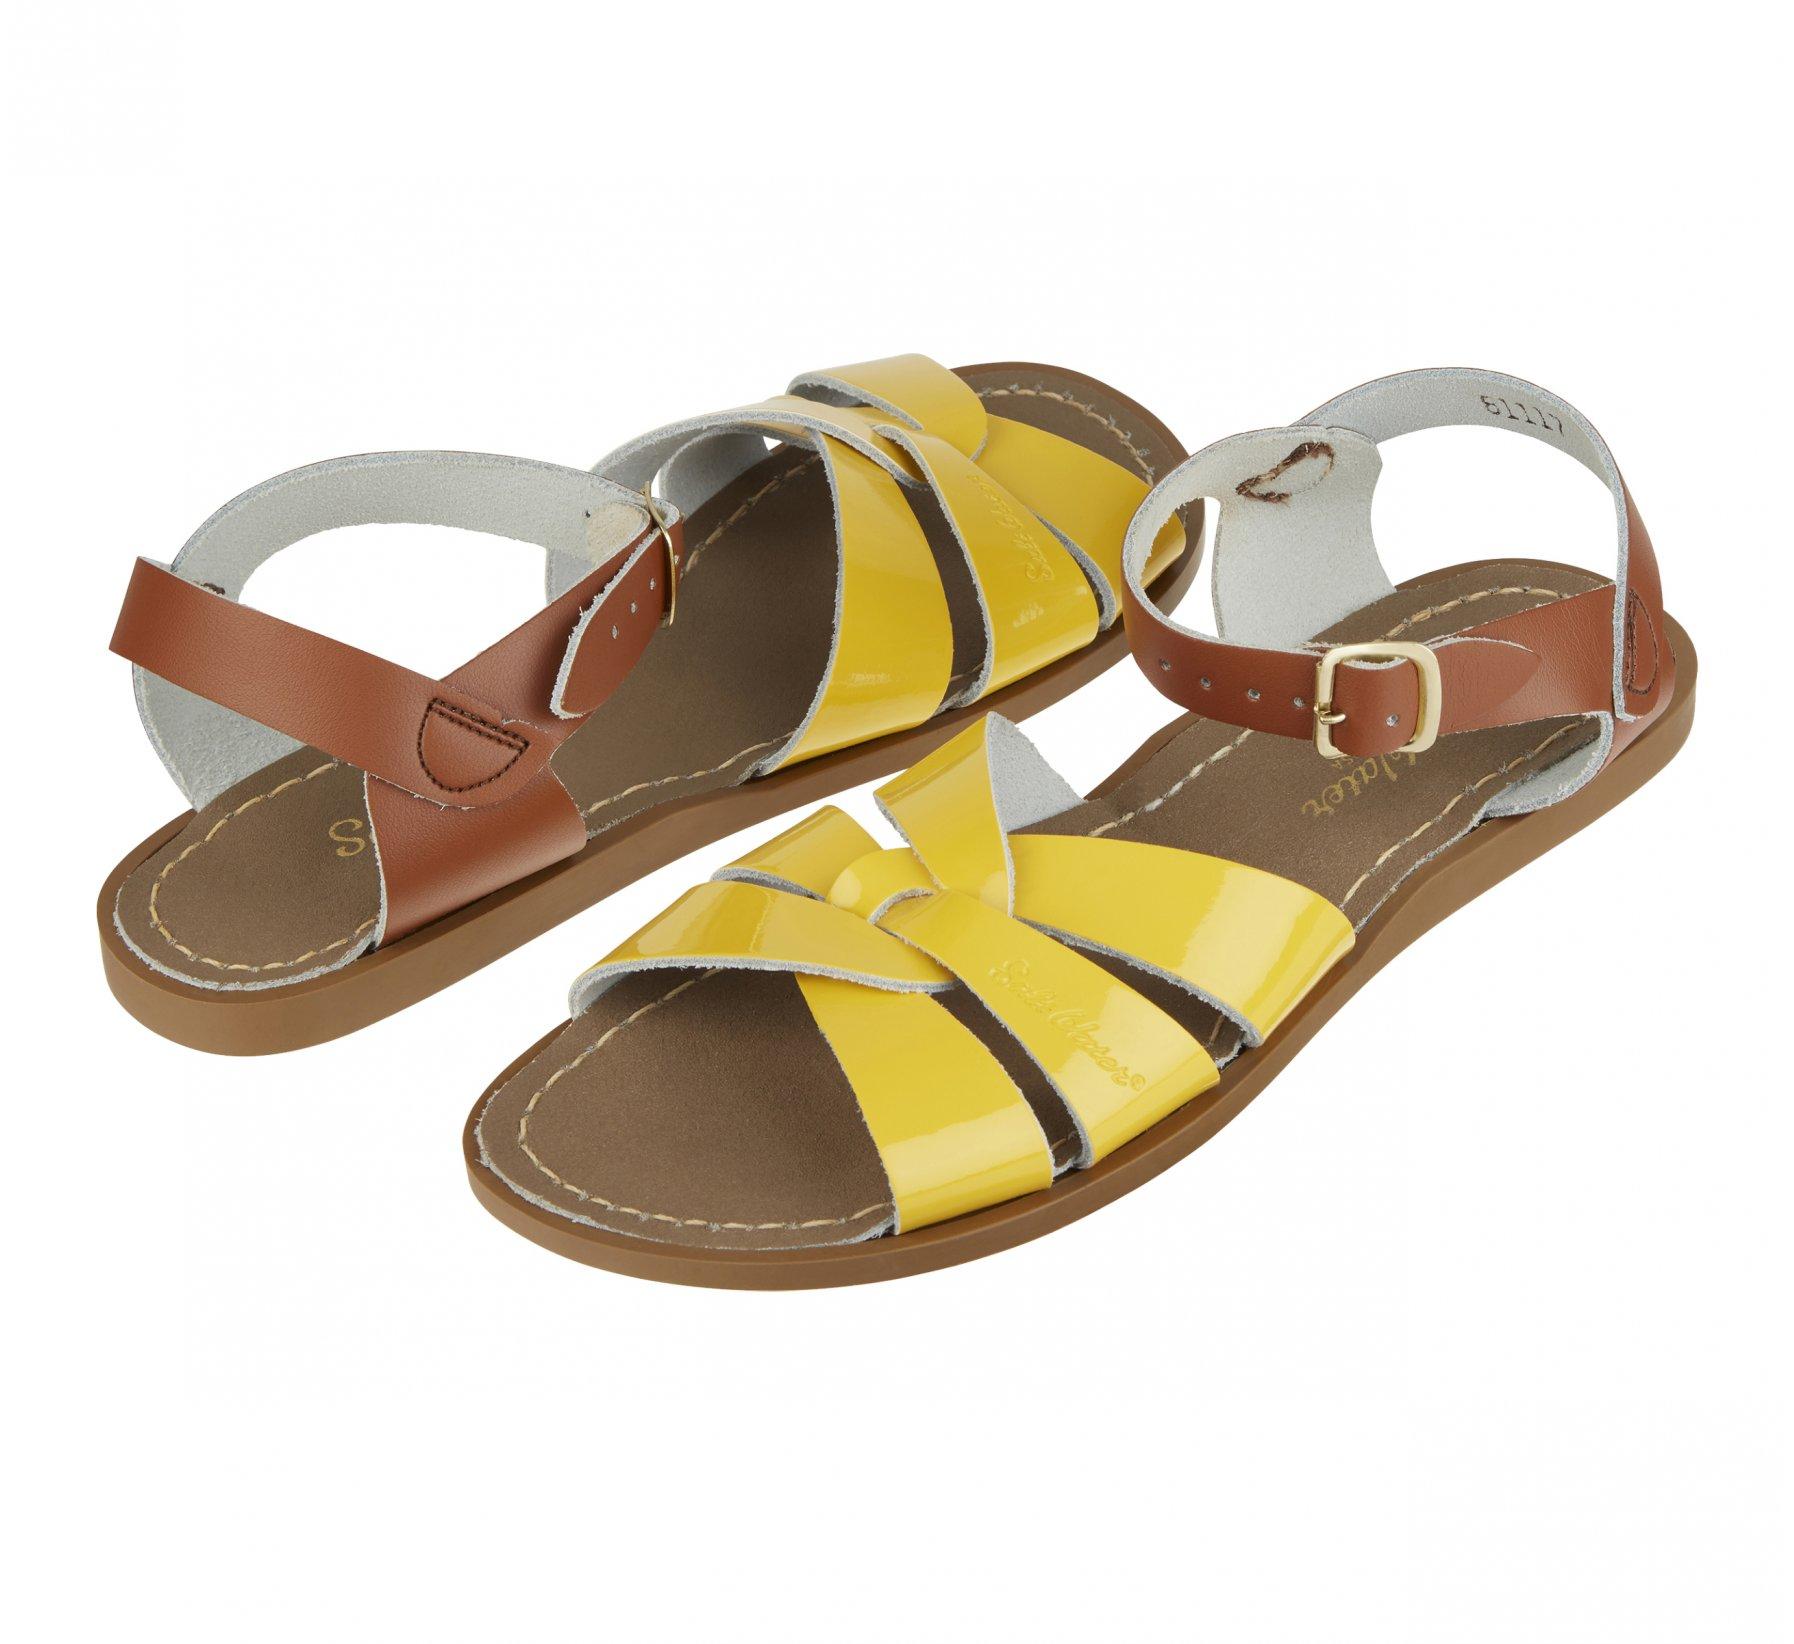 Original Mash-up Banoffee - Salt Water Sandals